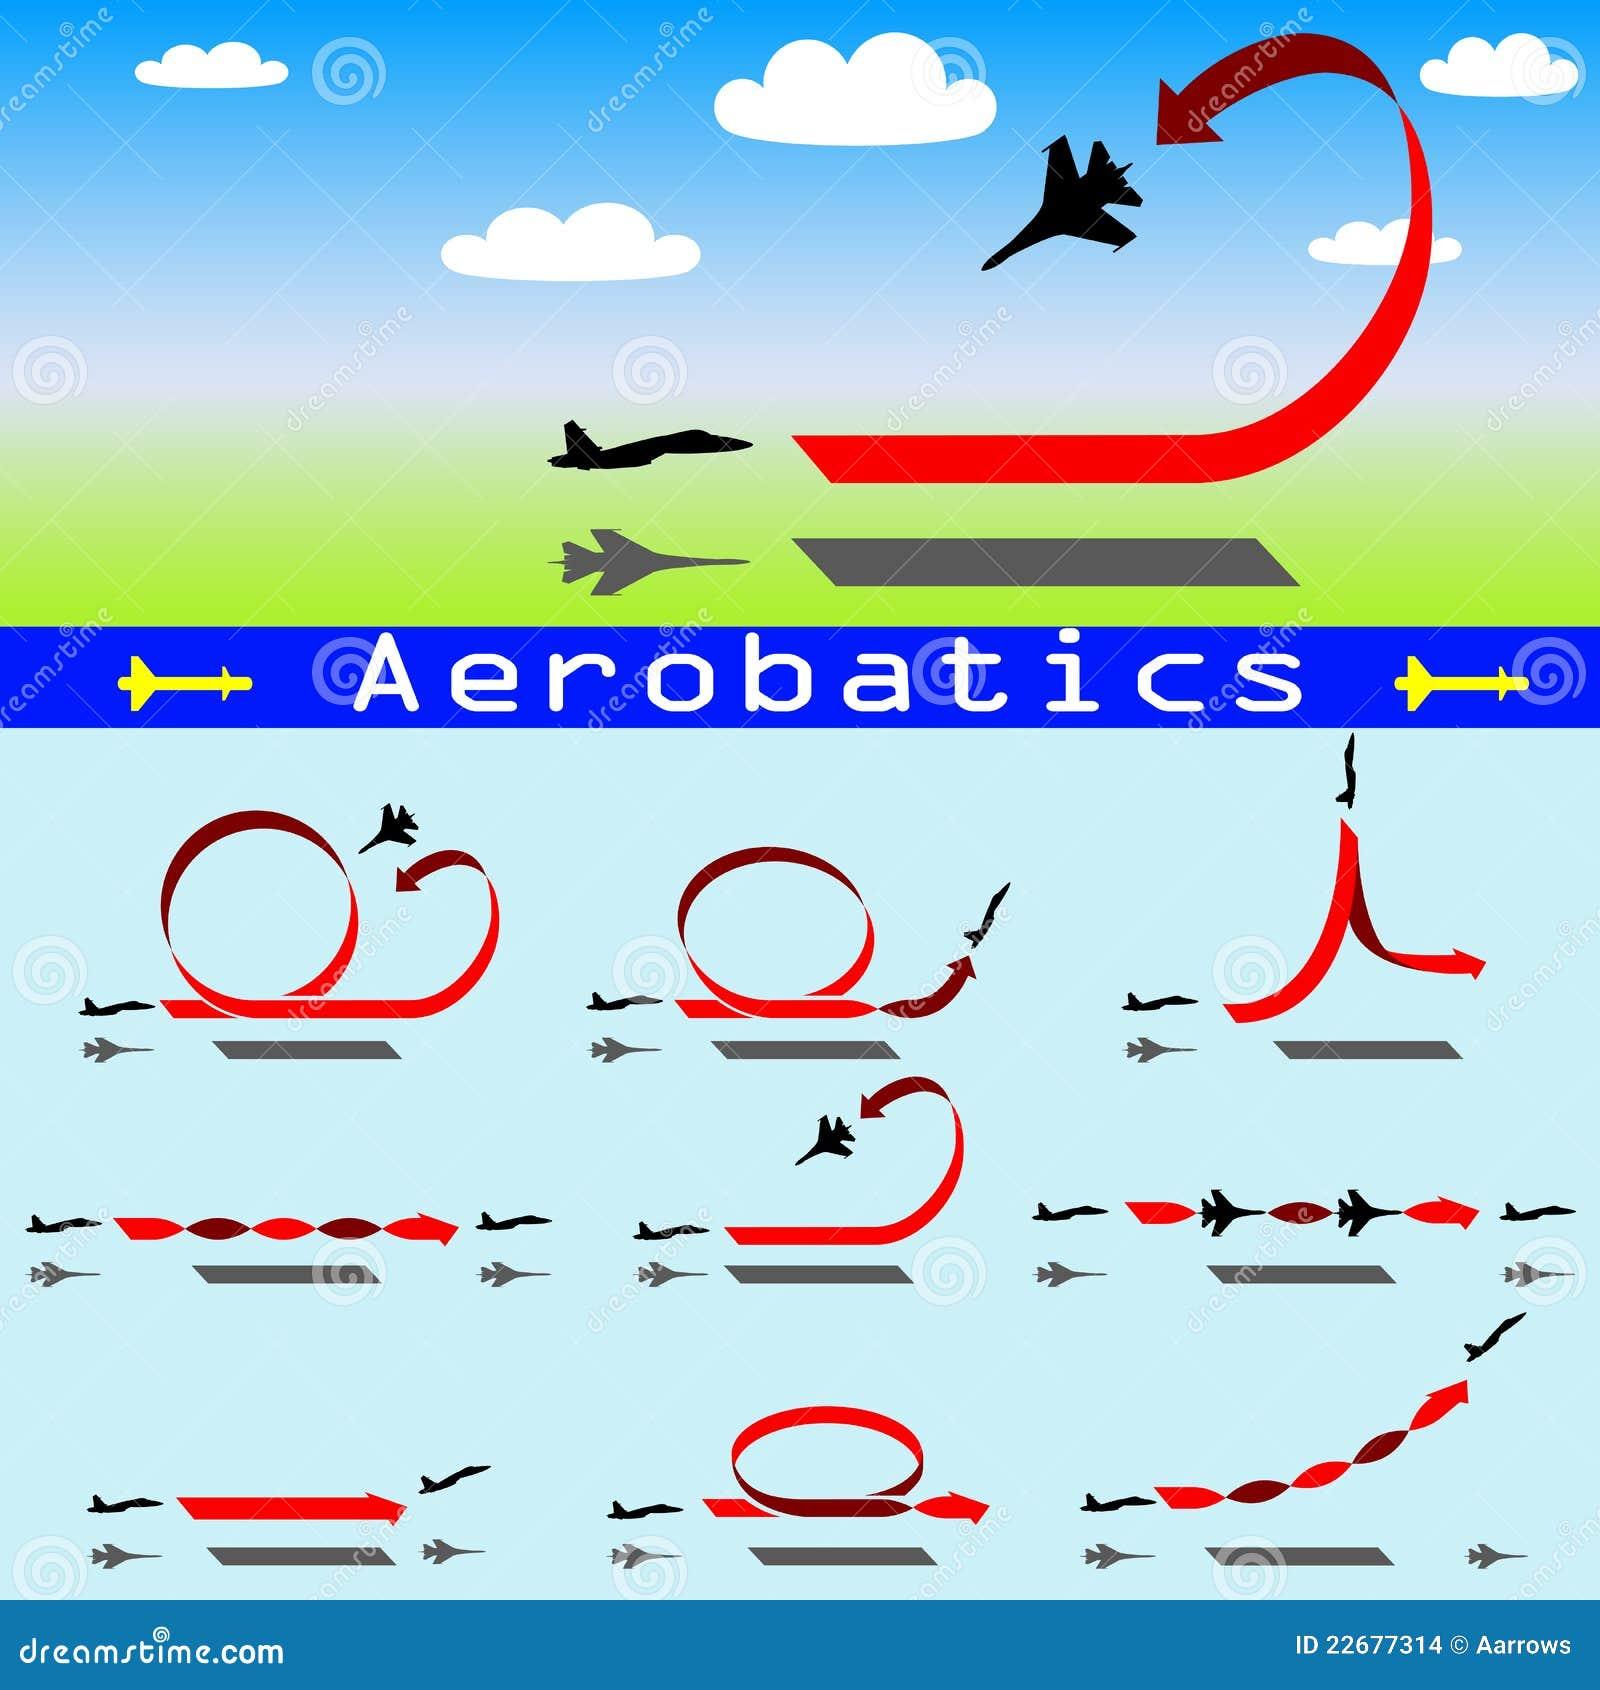 Avion de vols acrobatiques sur le fond de ciel bleu